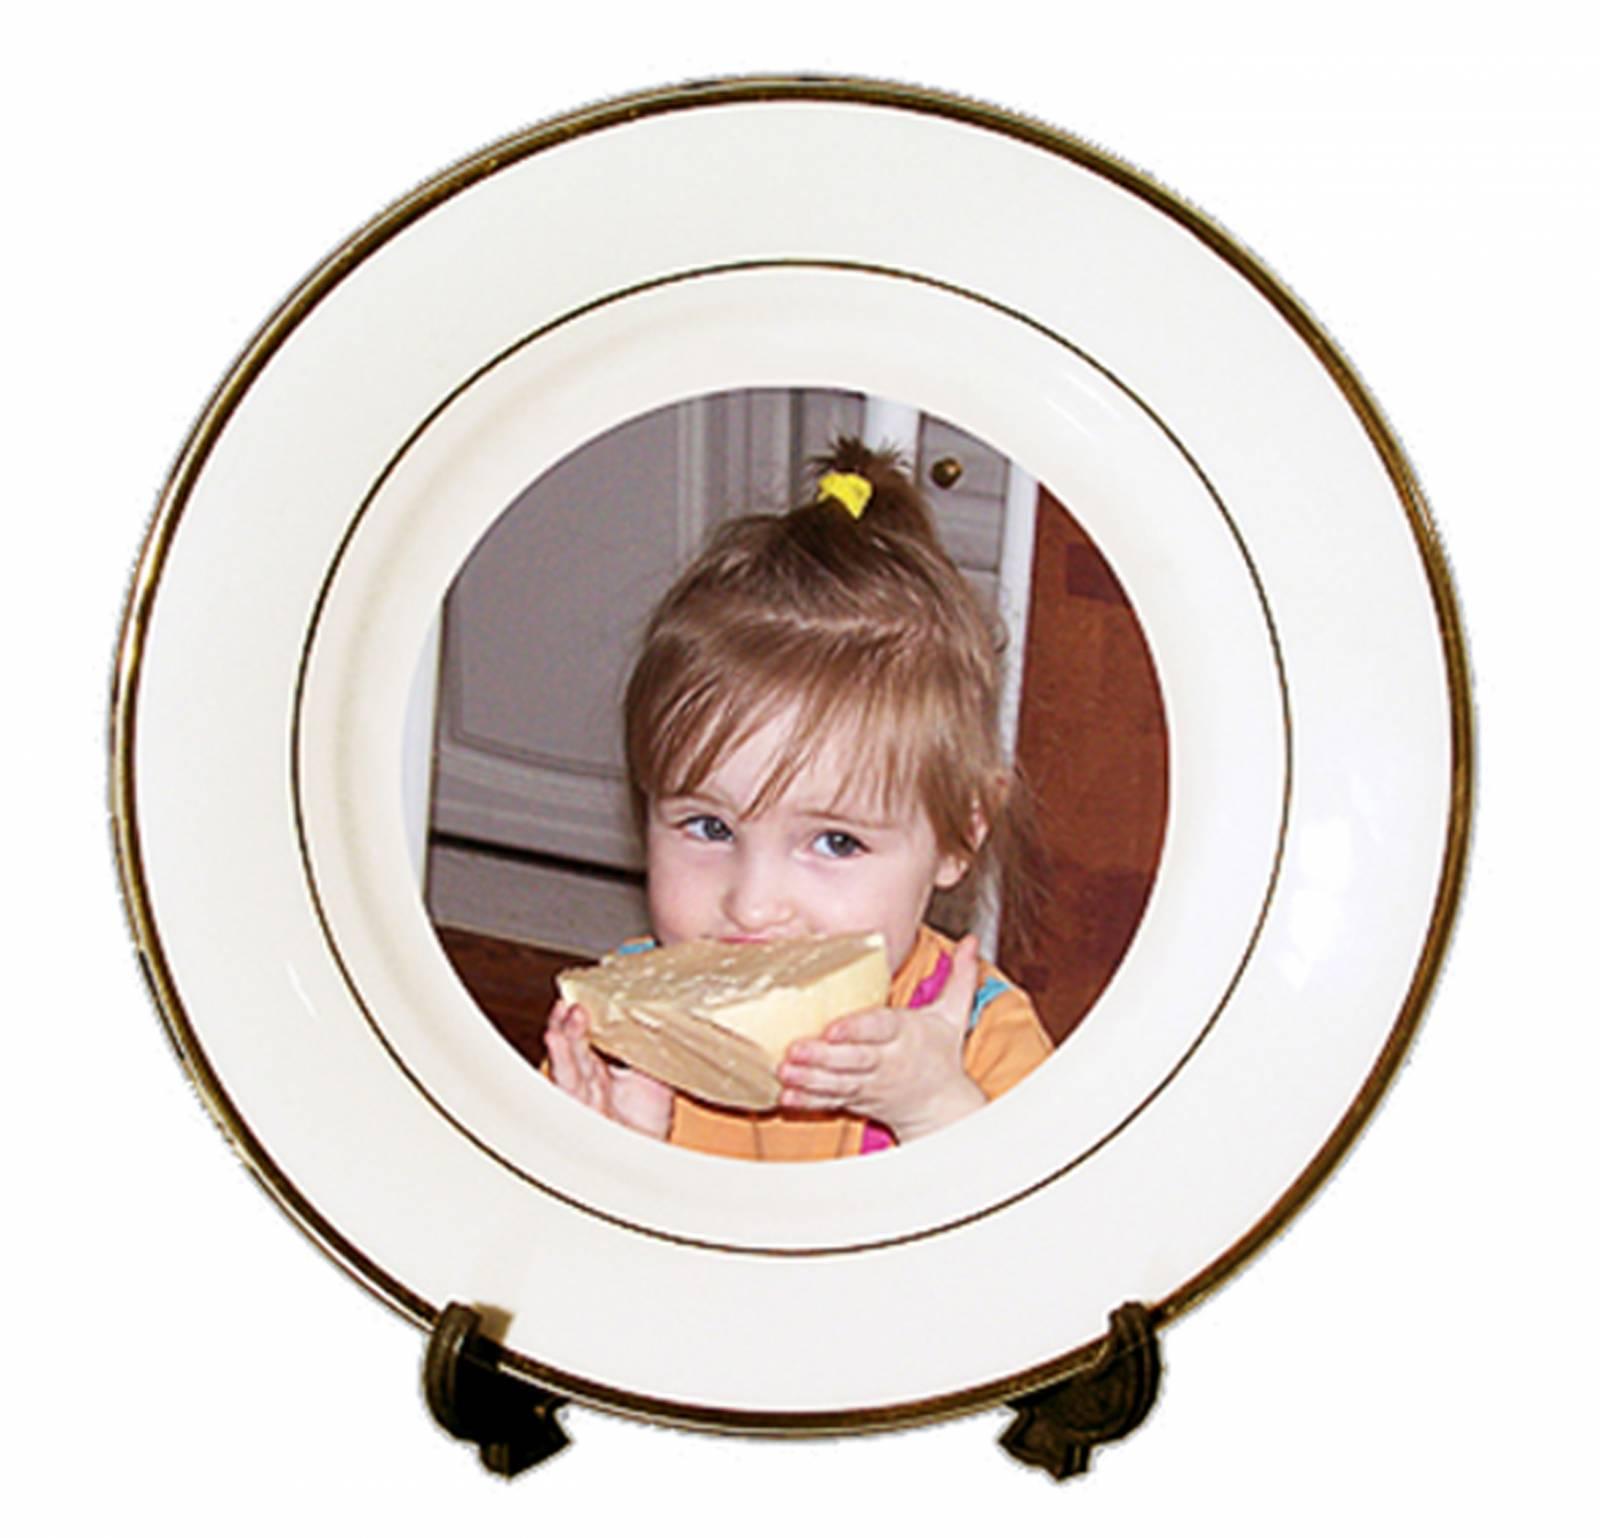 Где делают фото на тарелки